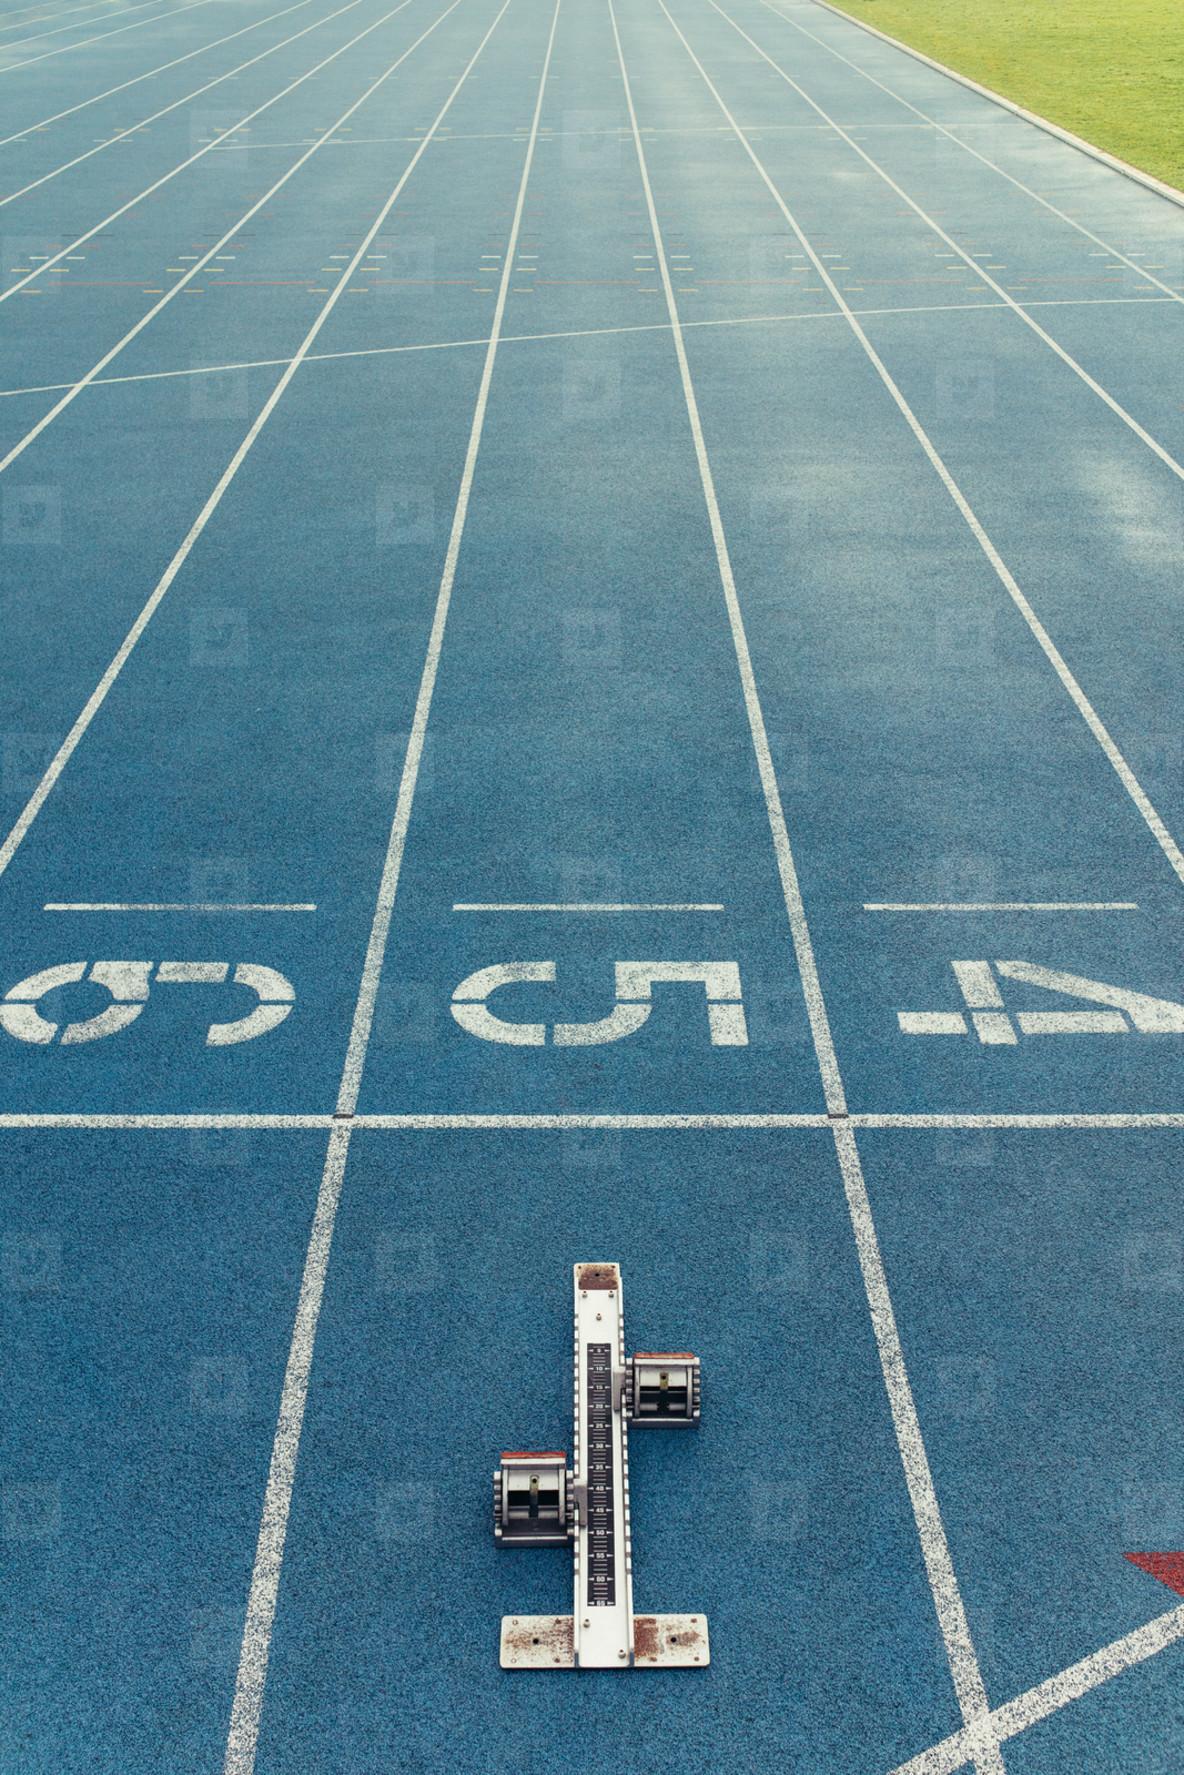 Starting block on a running track